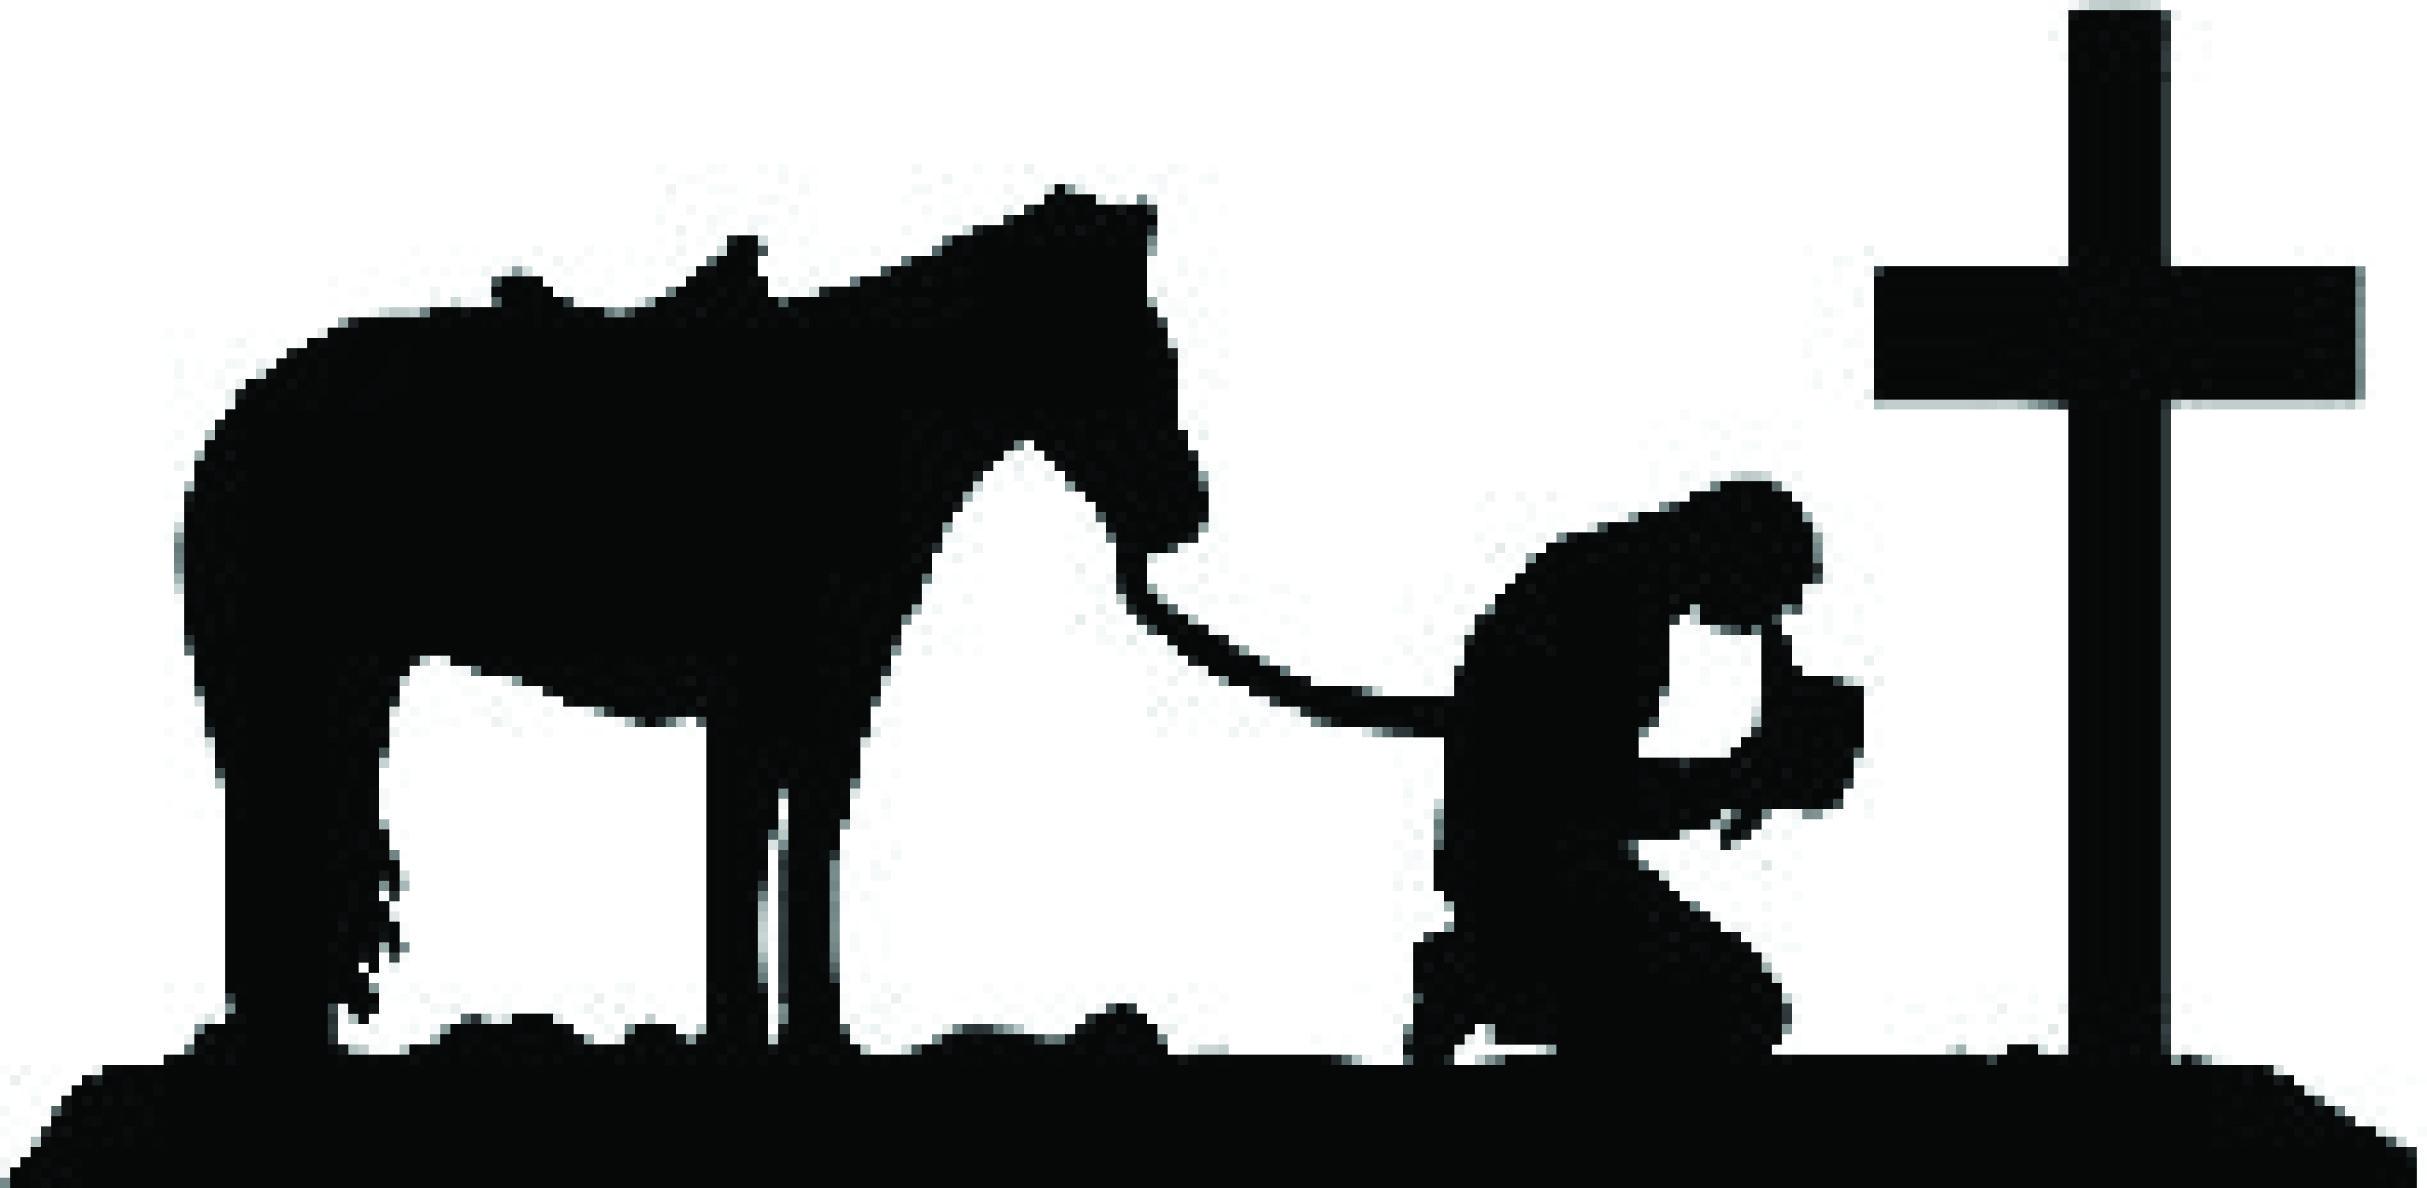 Praying cowboy clipart.